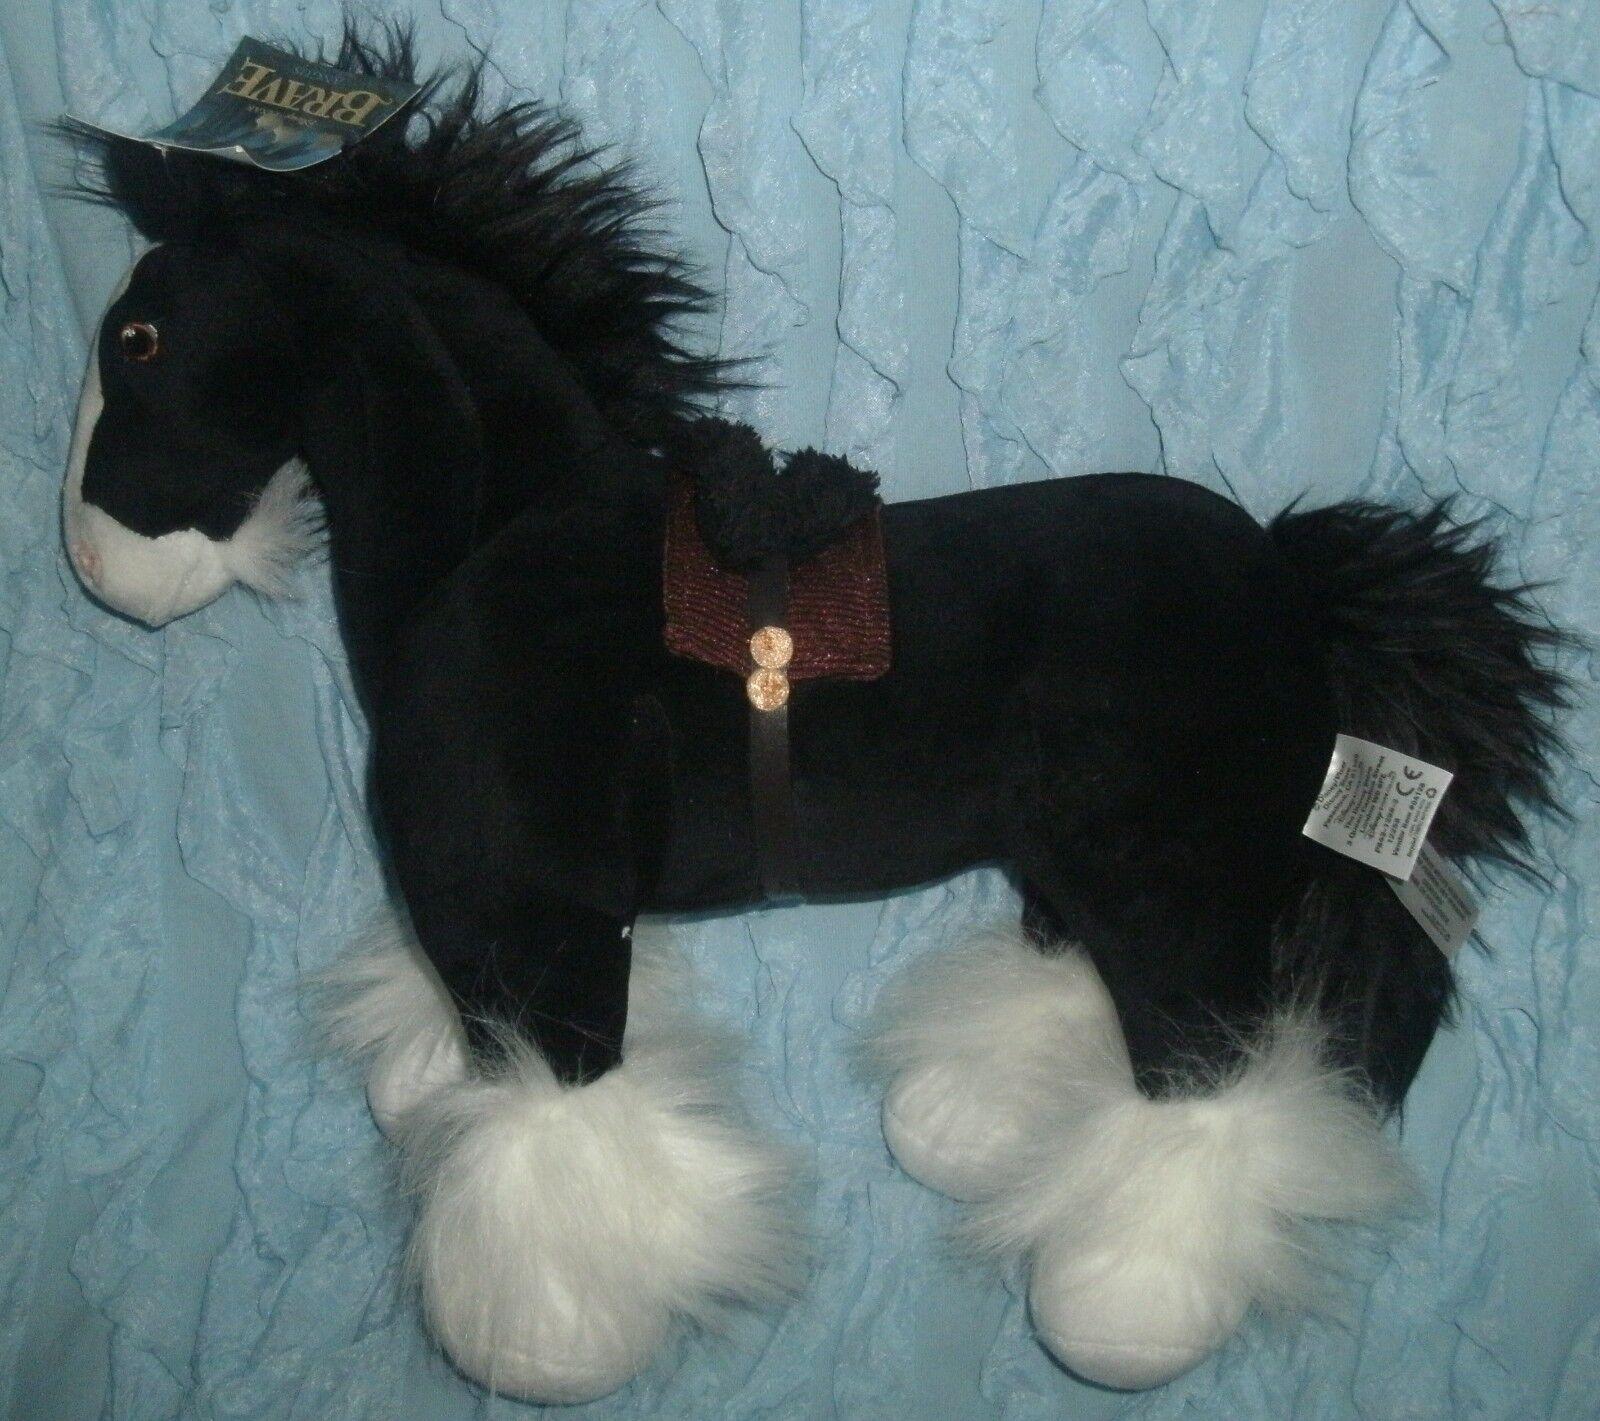 disney brave merida angus the horse plush - 14 high | ebay